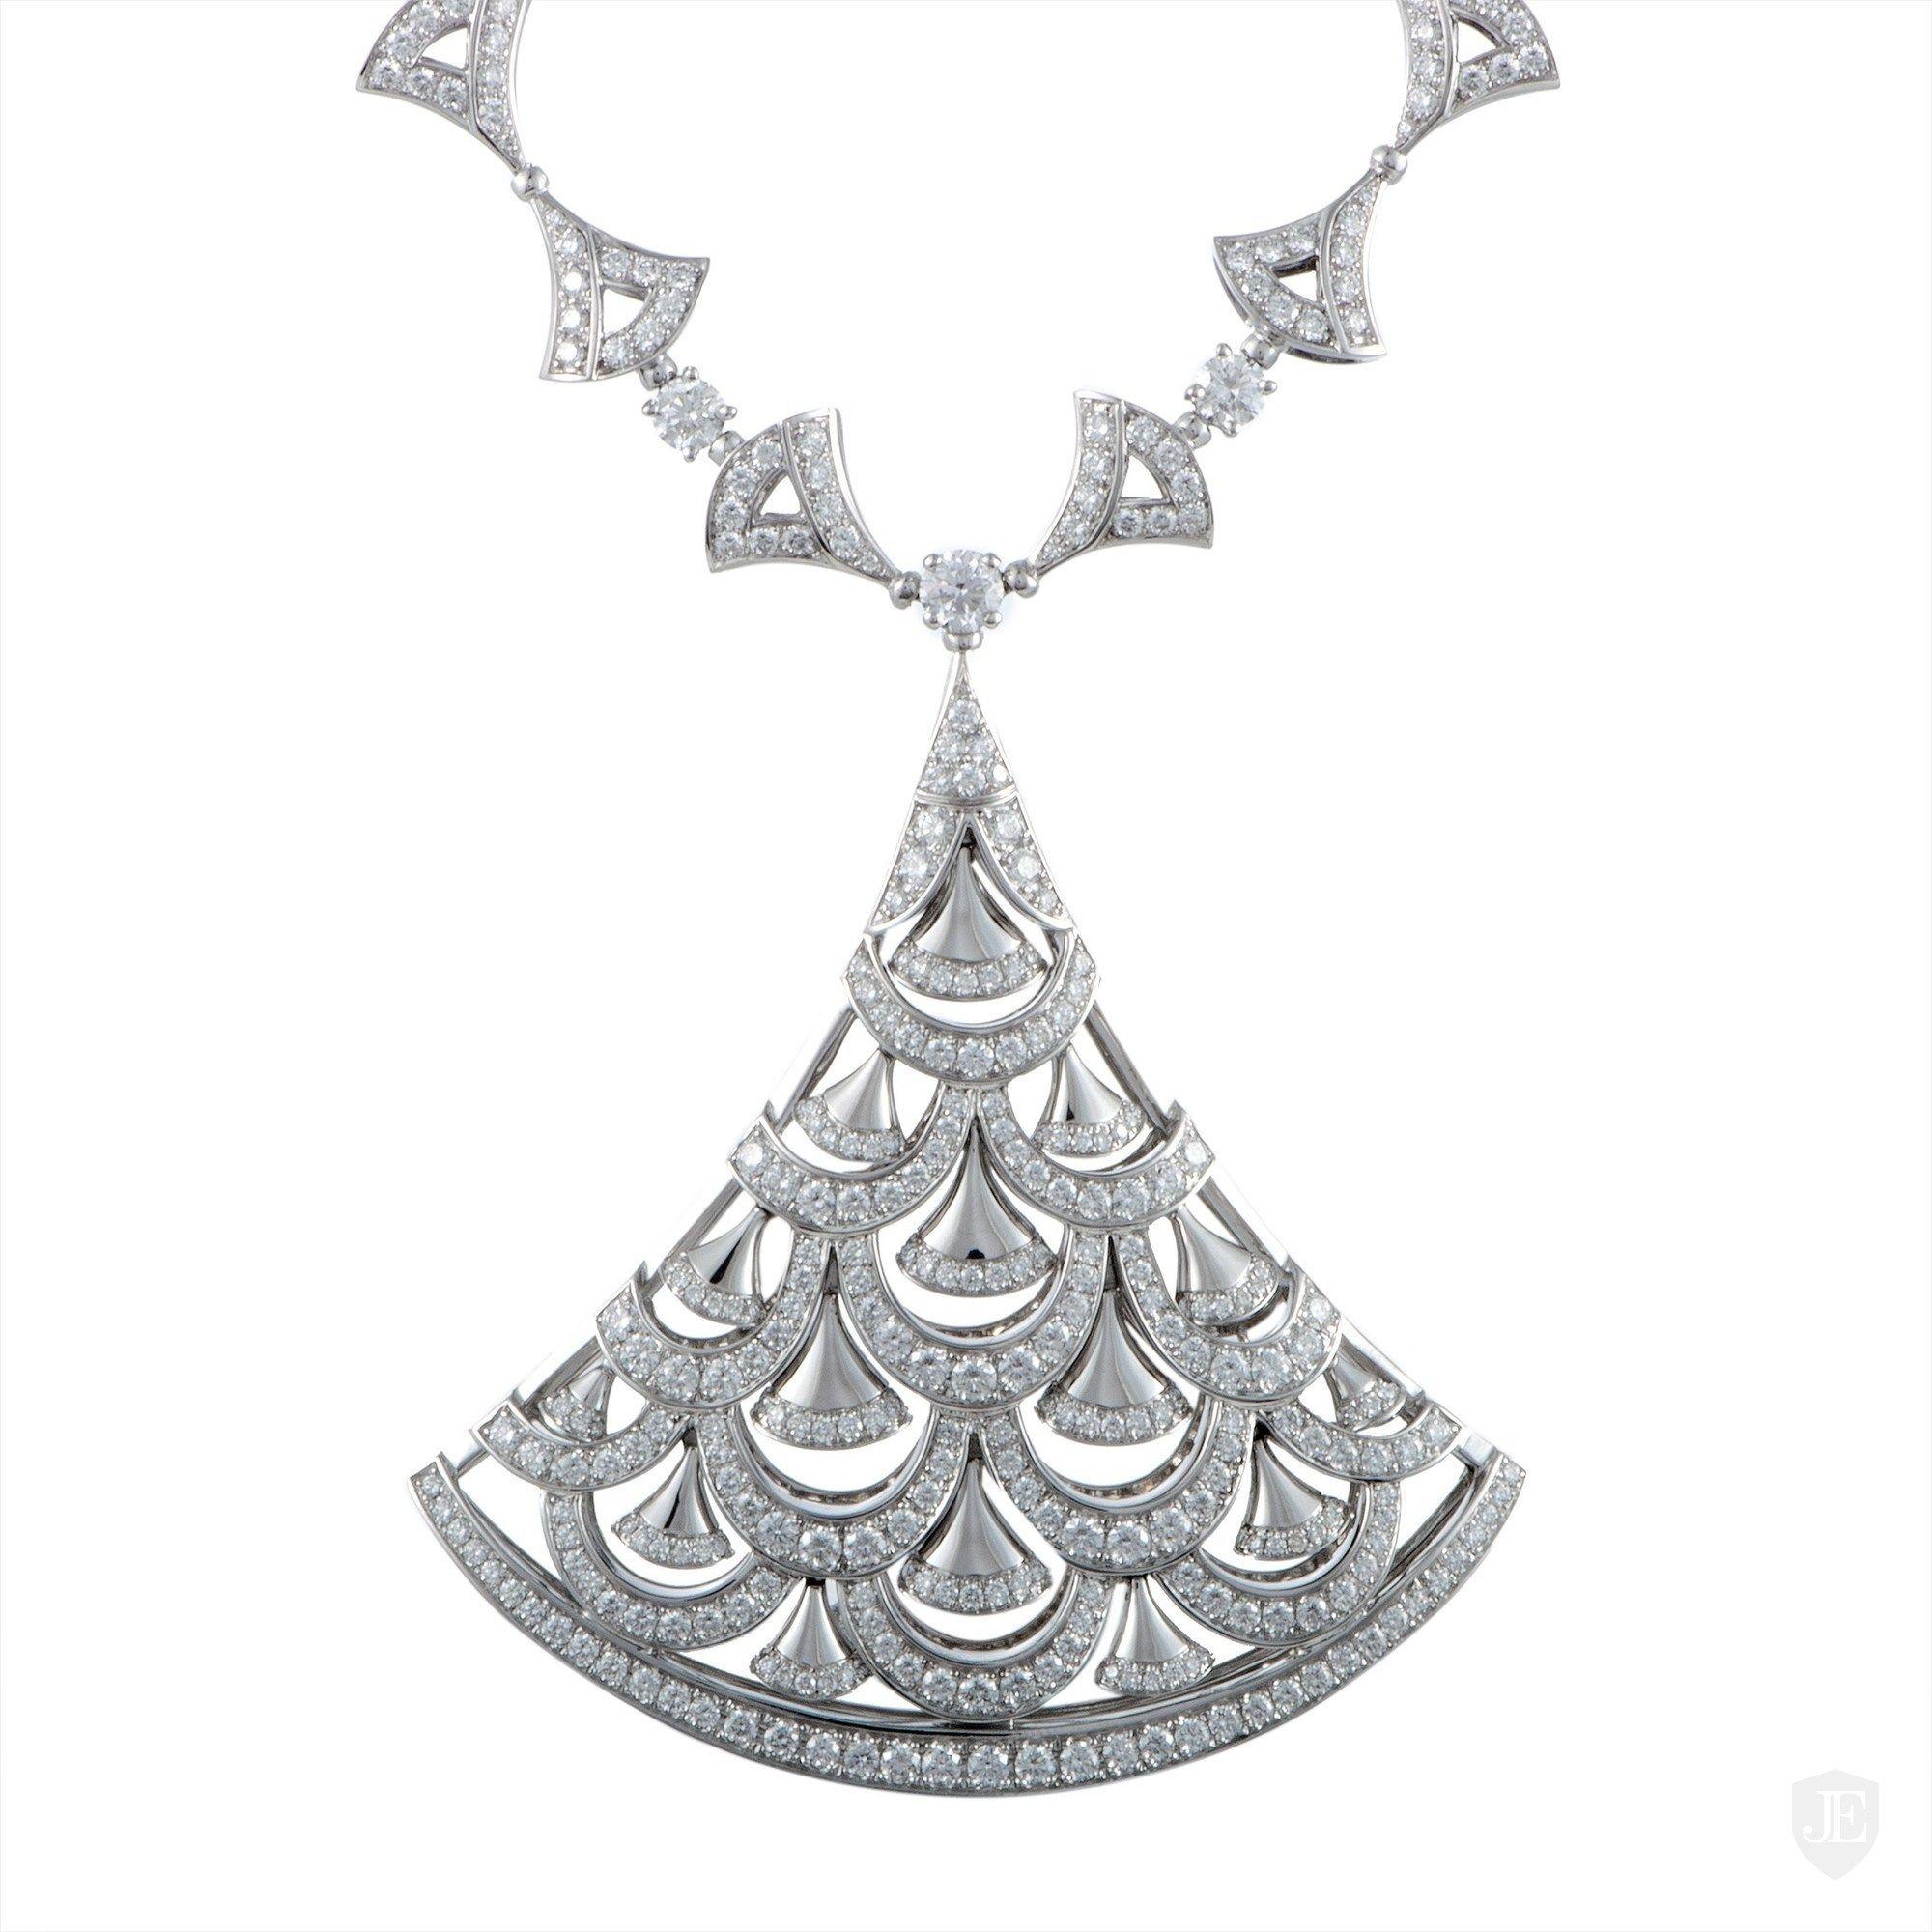 Bvlgari Diva's Dream 18K White Gold Diamond Pave Large Pendant Necklace